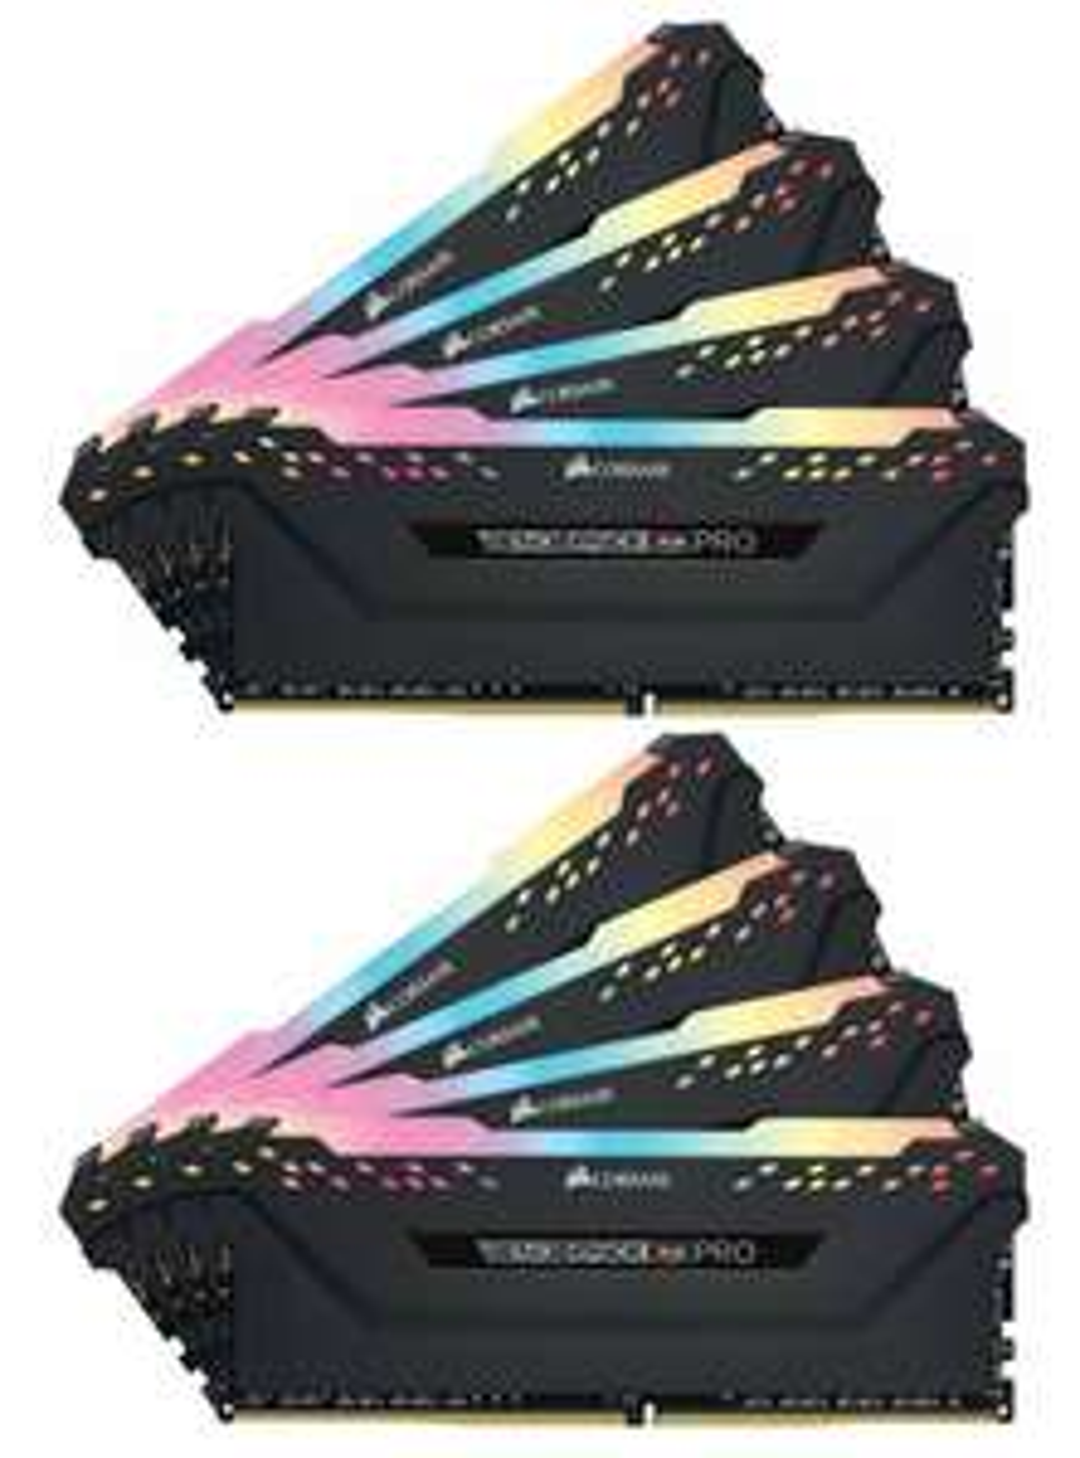 Corsair Vengeance RGB PRO 64GB (8x8GB) DDR4-RAM 3000MHz C15 XMP 2.0 Enthusiast LED Speicherkit - schwarz